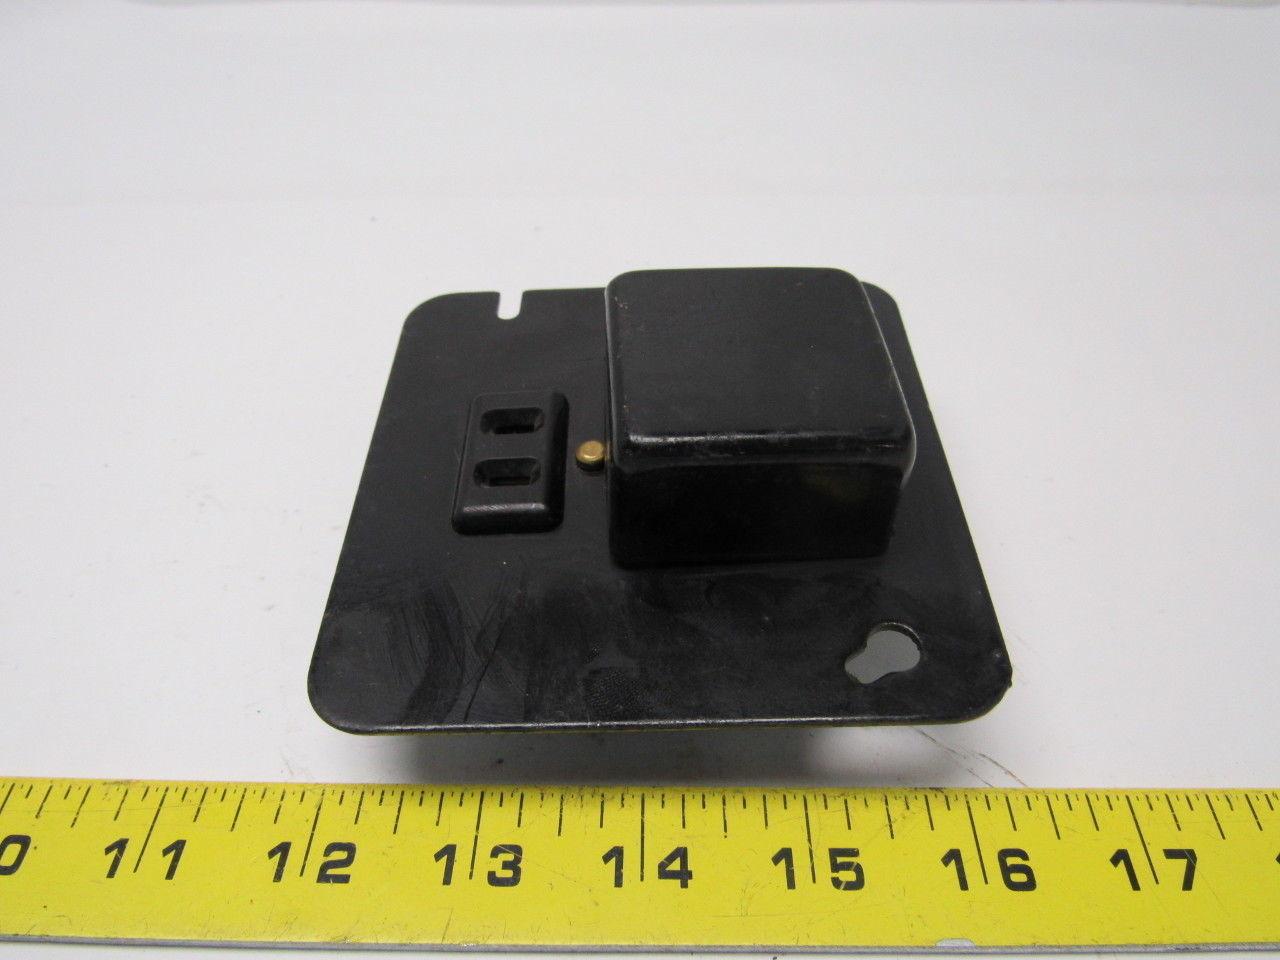 "Buss Bussman - SRY 4"" plug-fuse box cover 125V 15A"